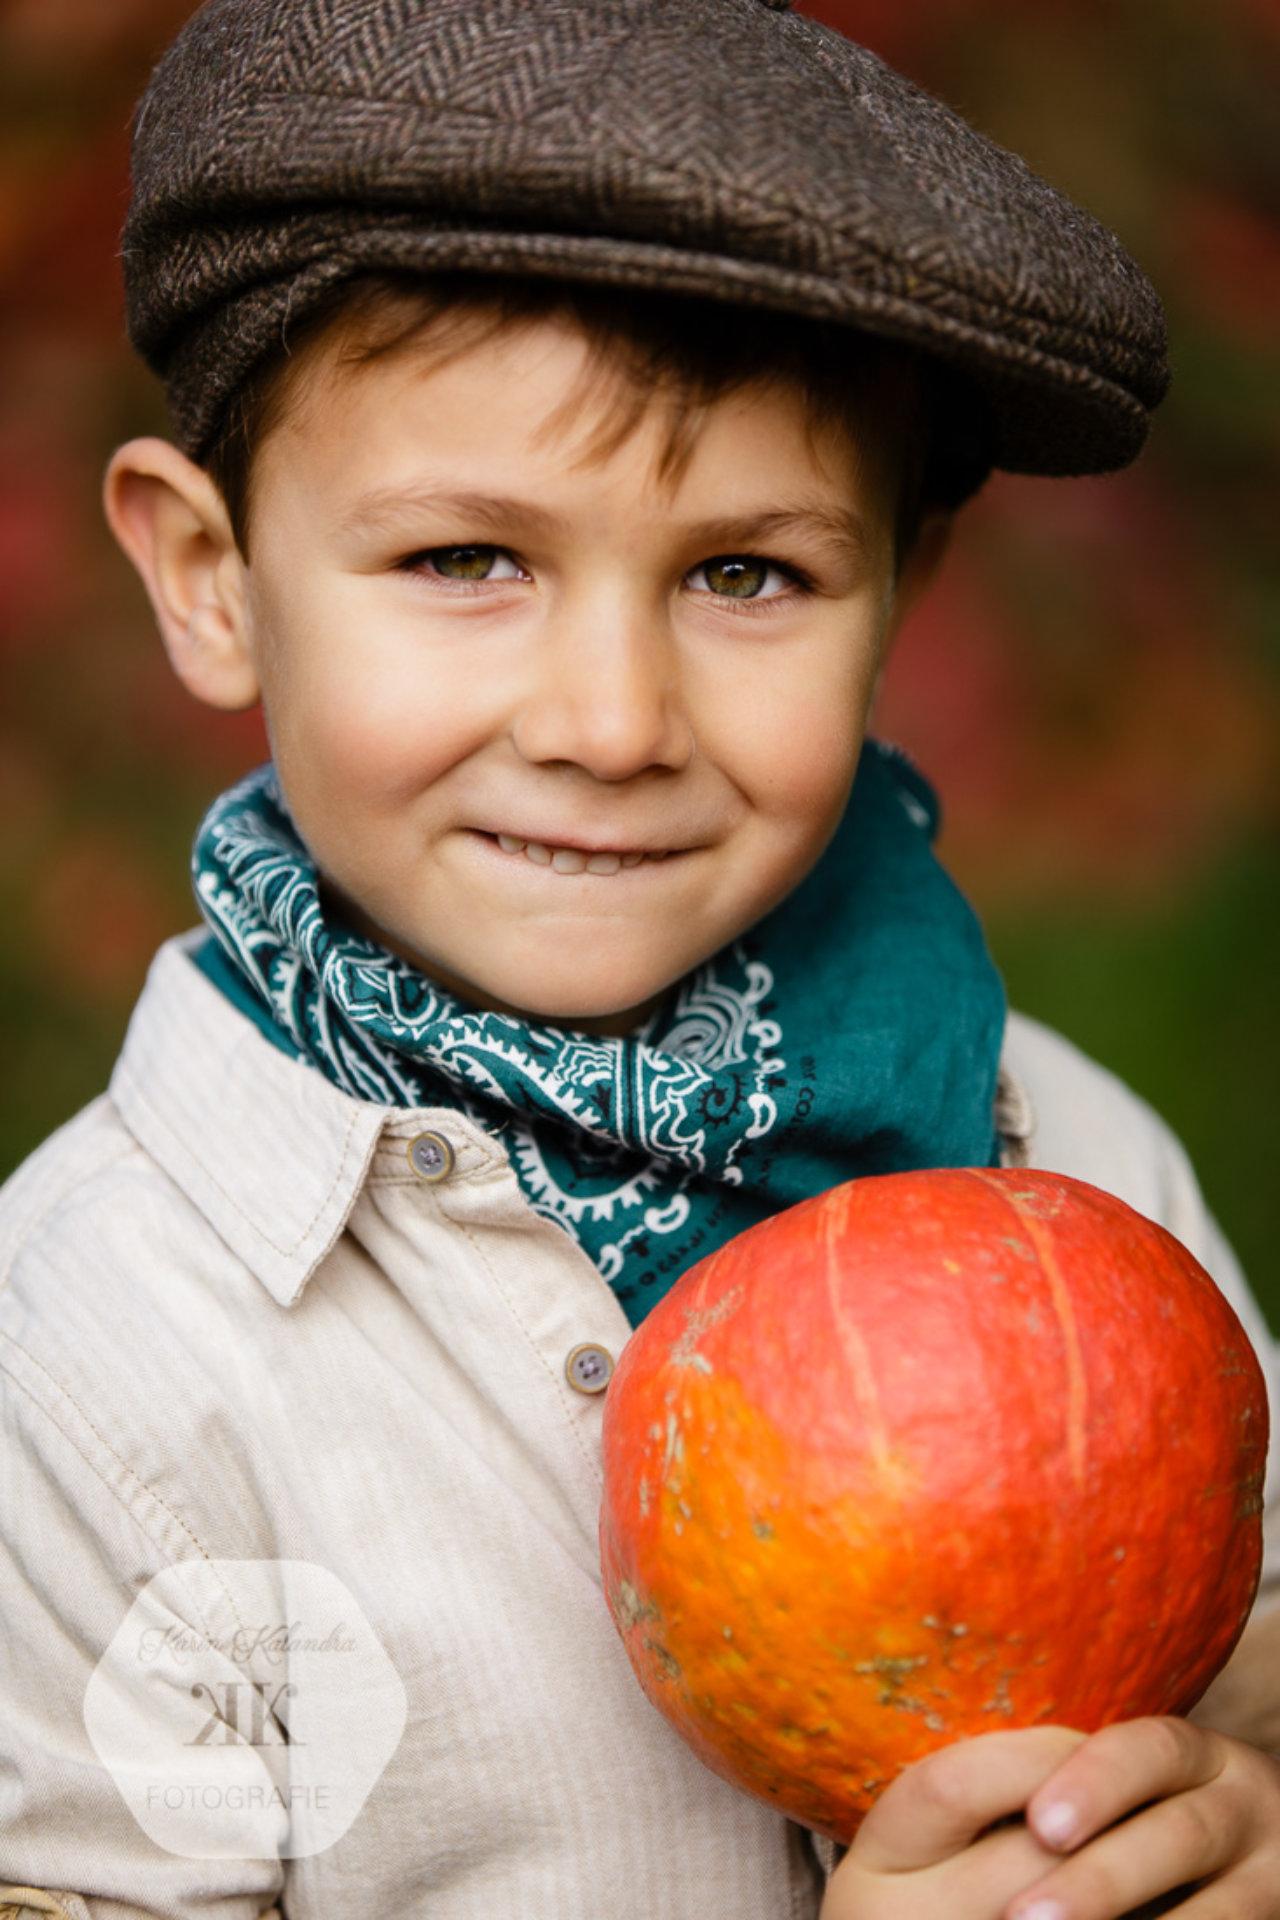 Herbstliches Mini-Kinderfotoshooting #3